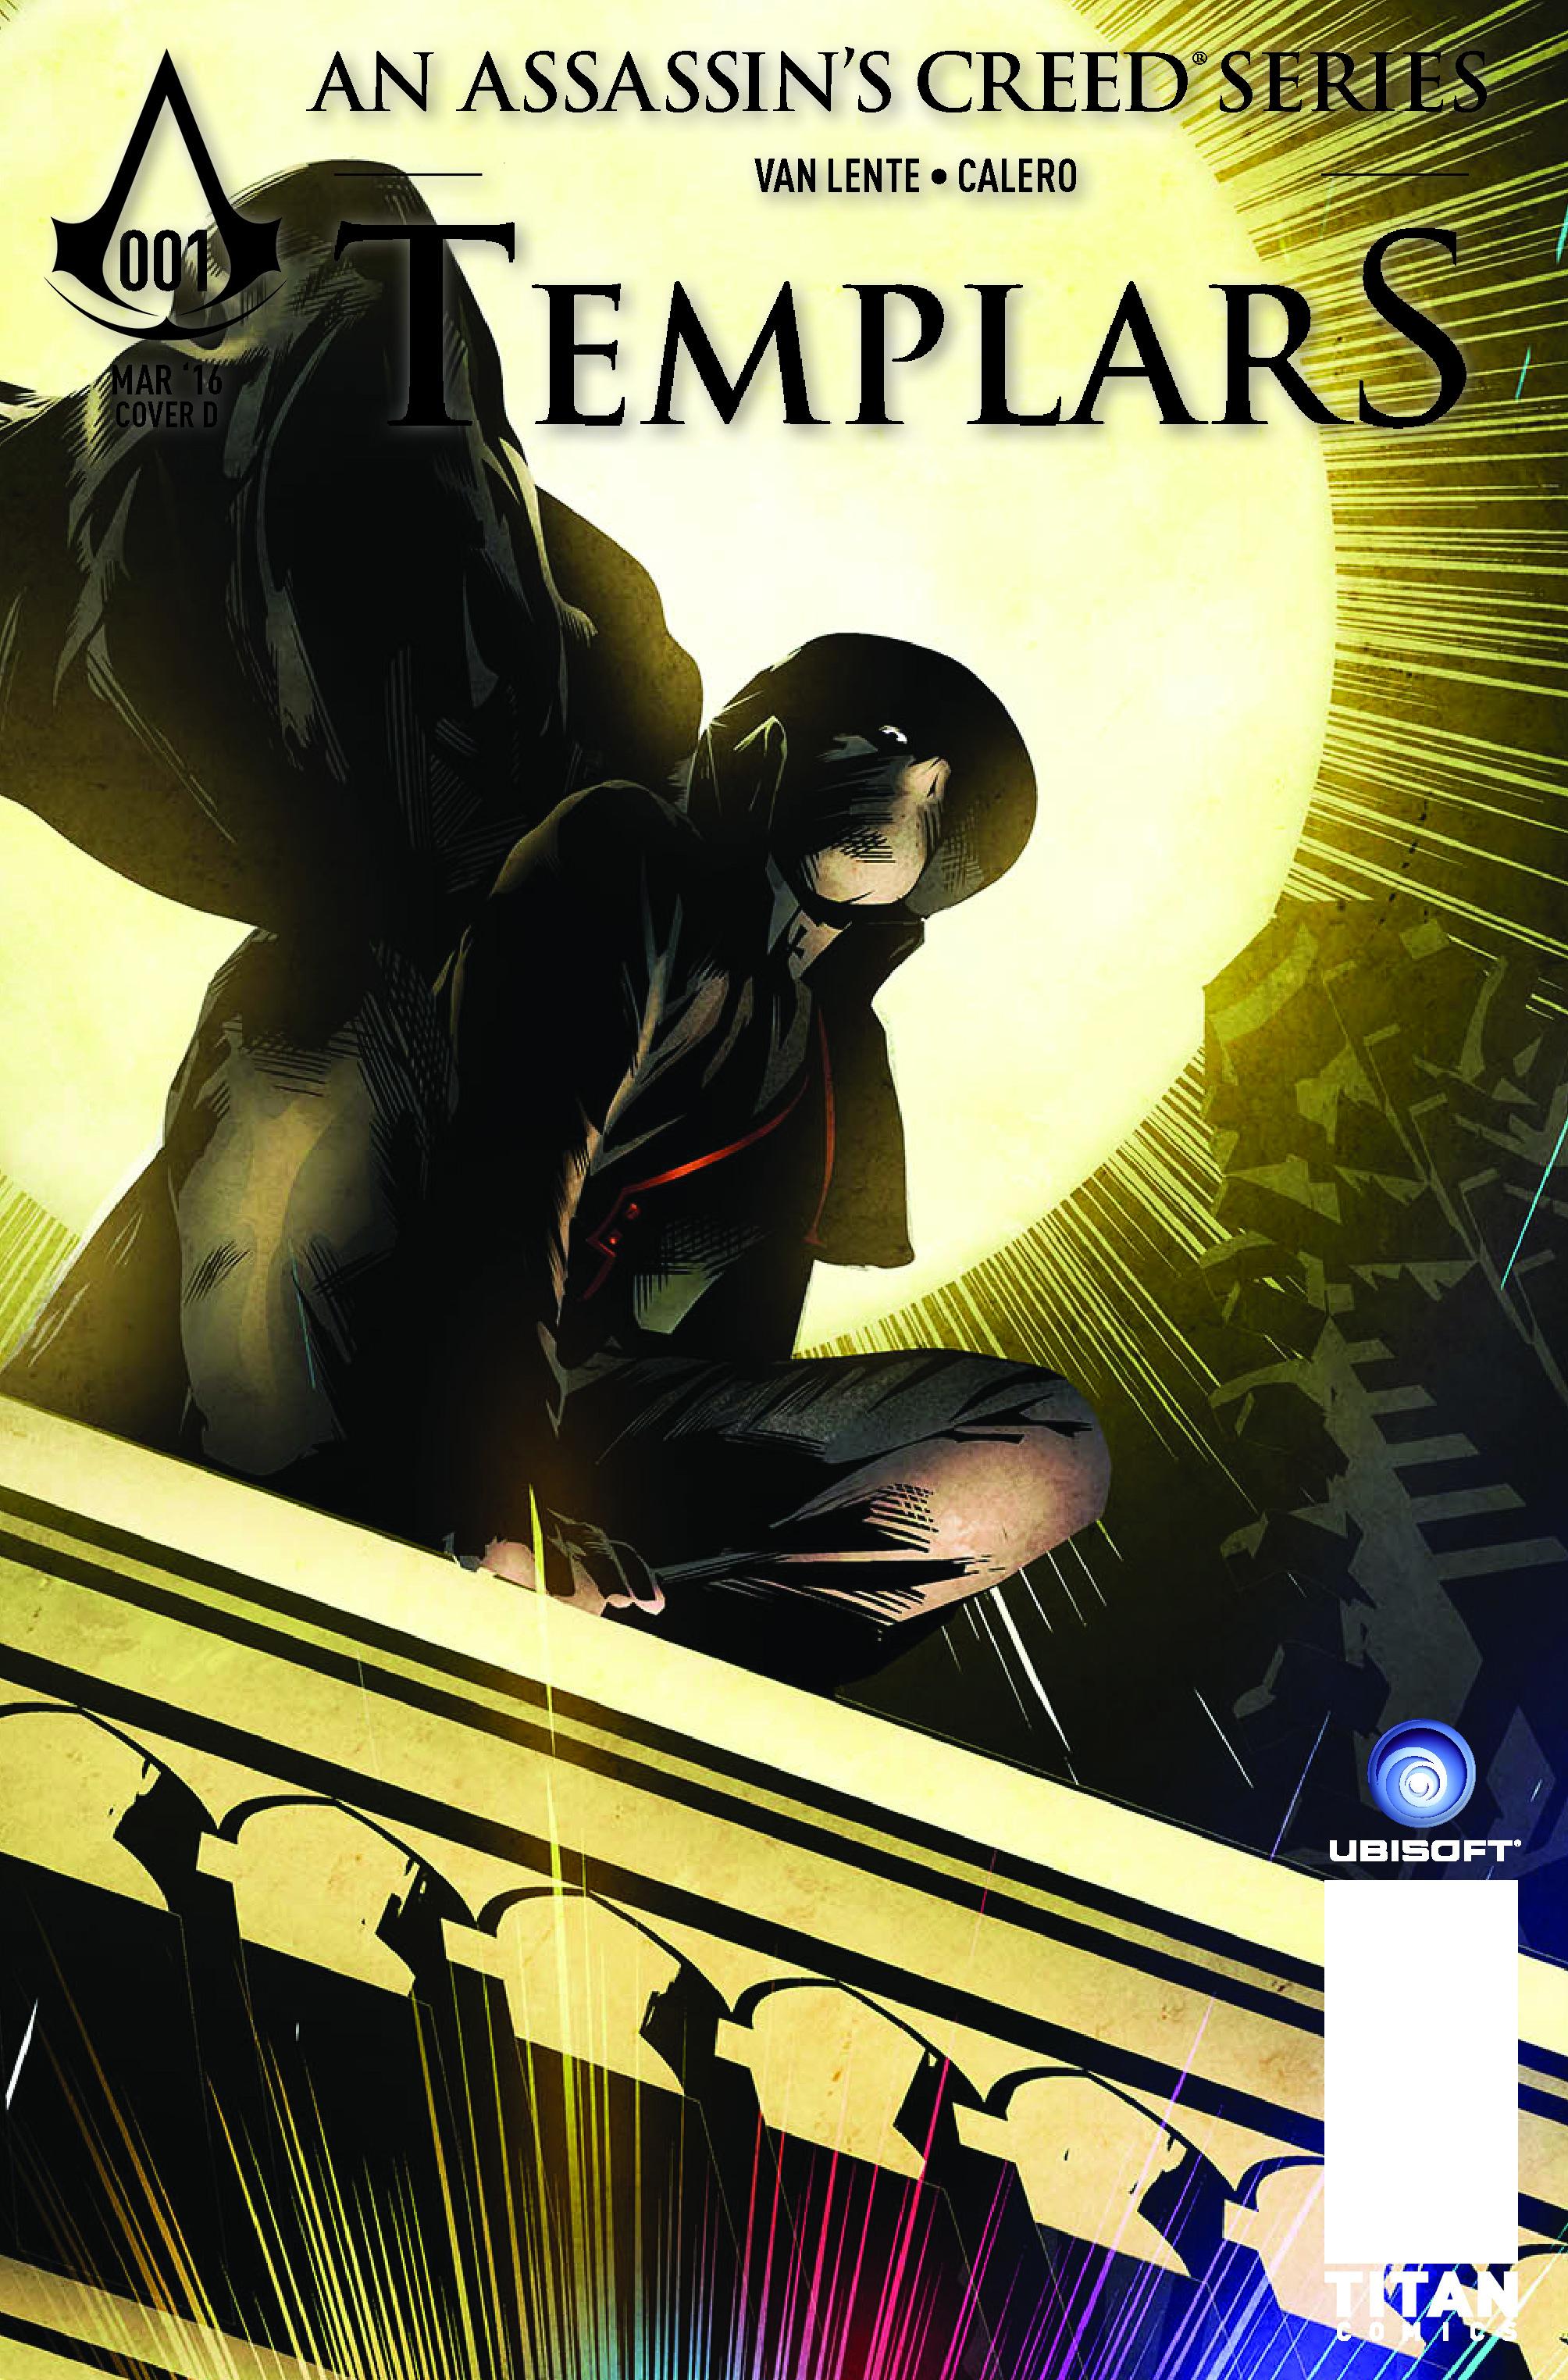 Cover C by Dennis Calero